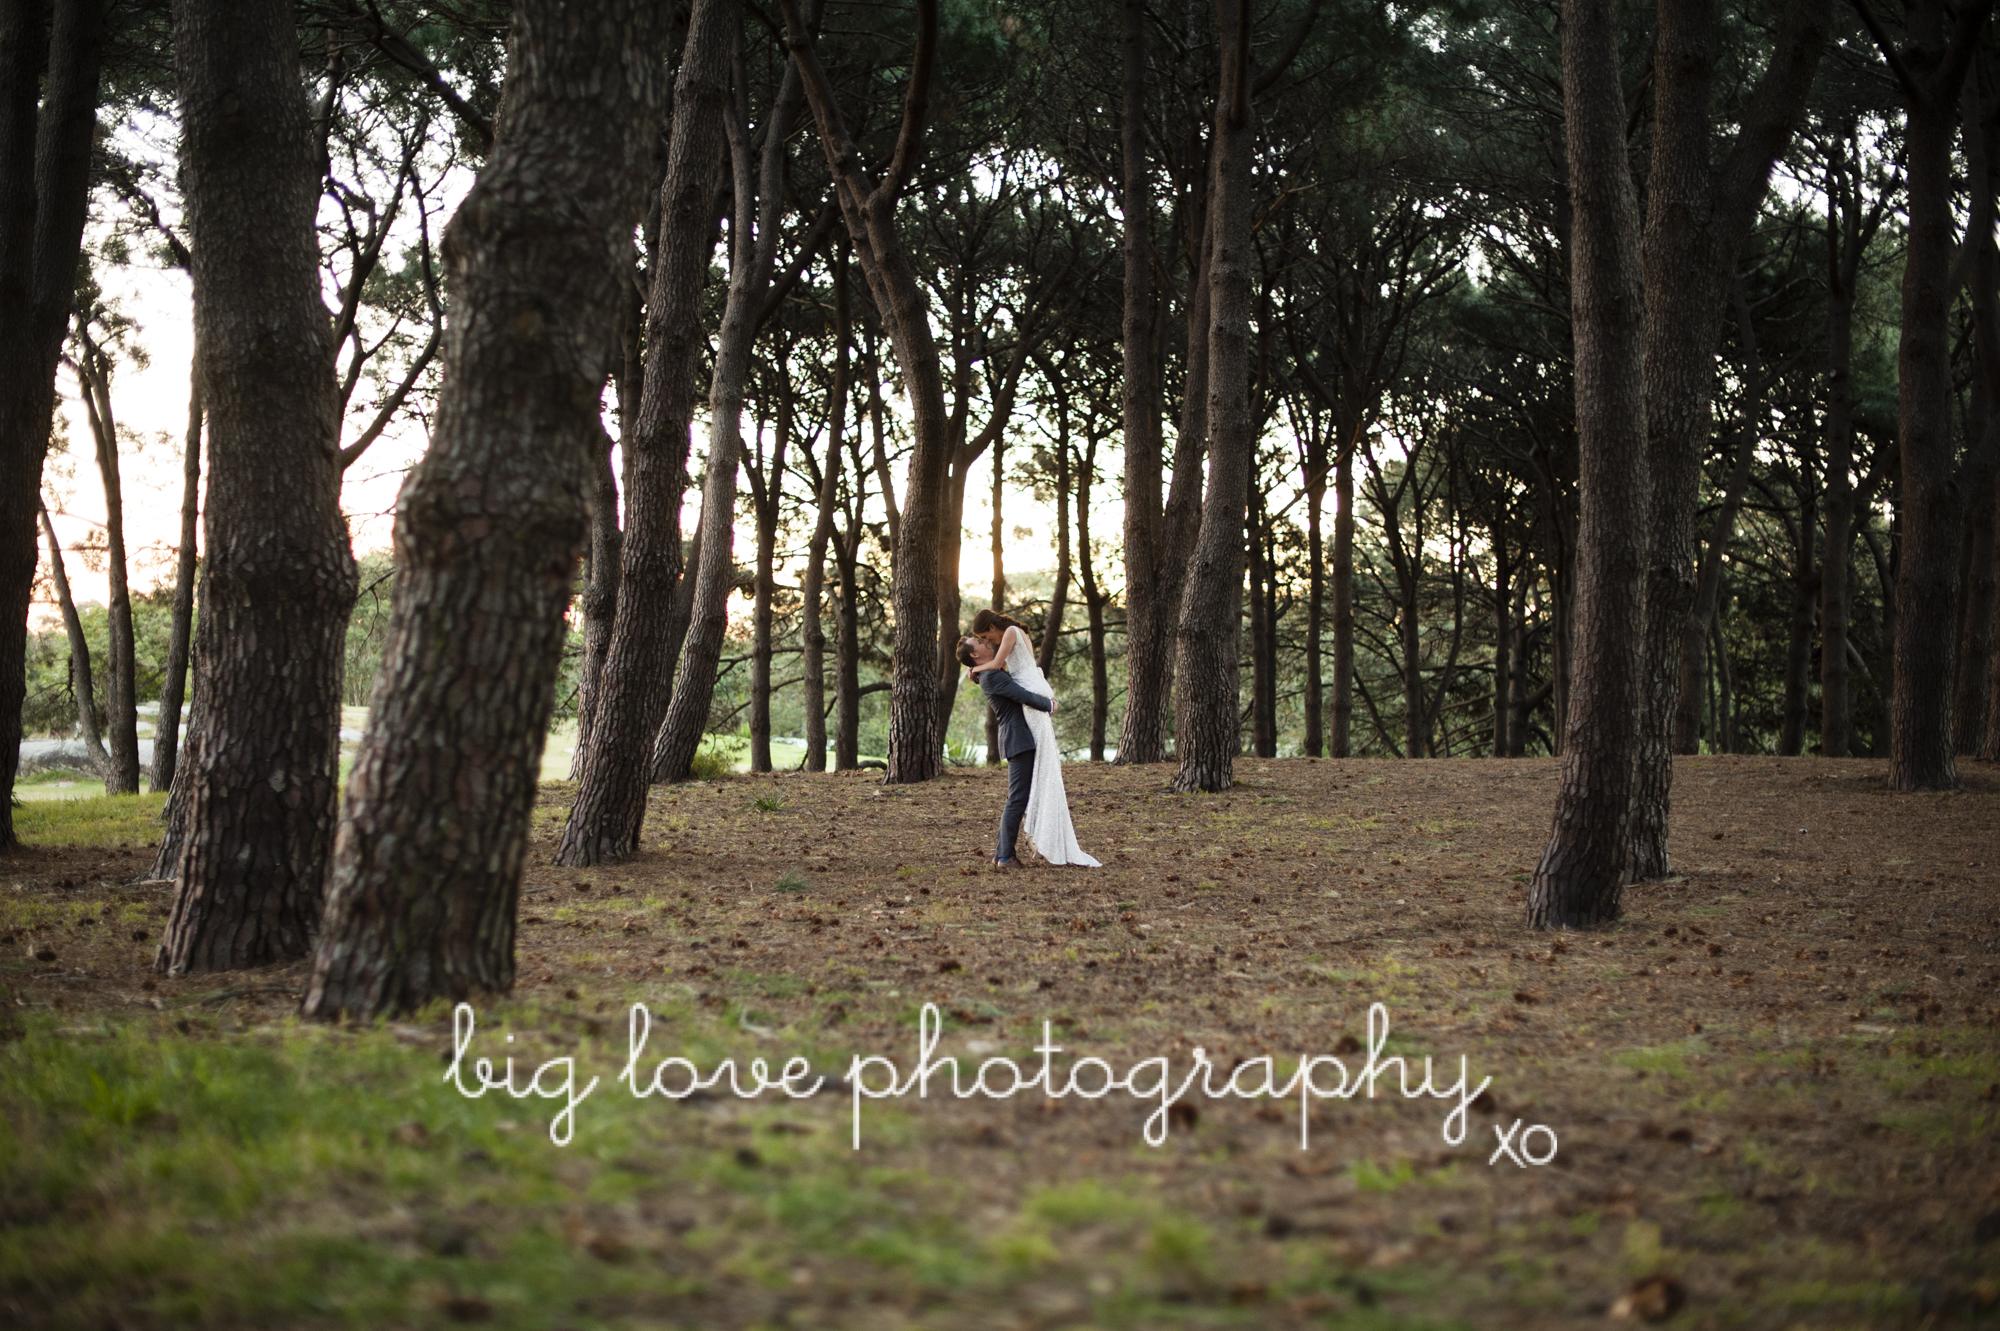 sydneyweddingphotography-4003.jpg